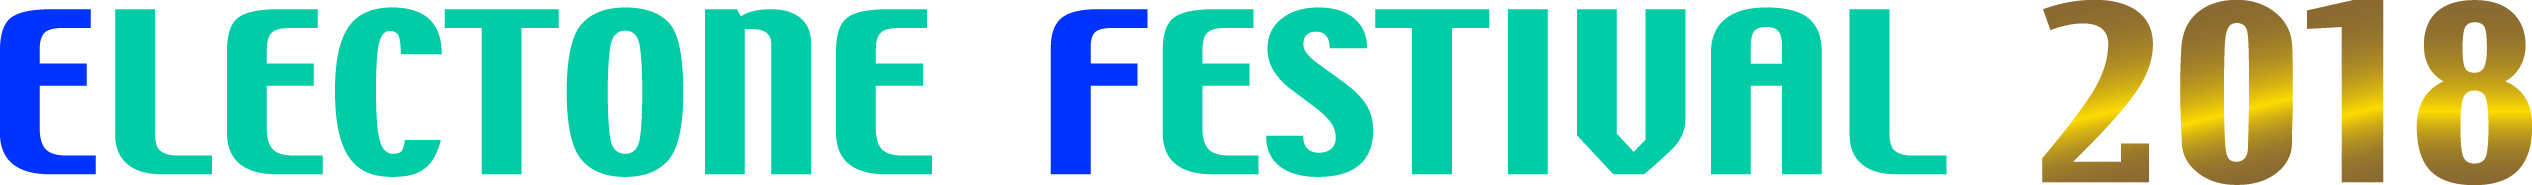 ELECTONE FESTIVALロゴ-2018